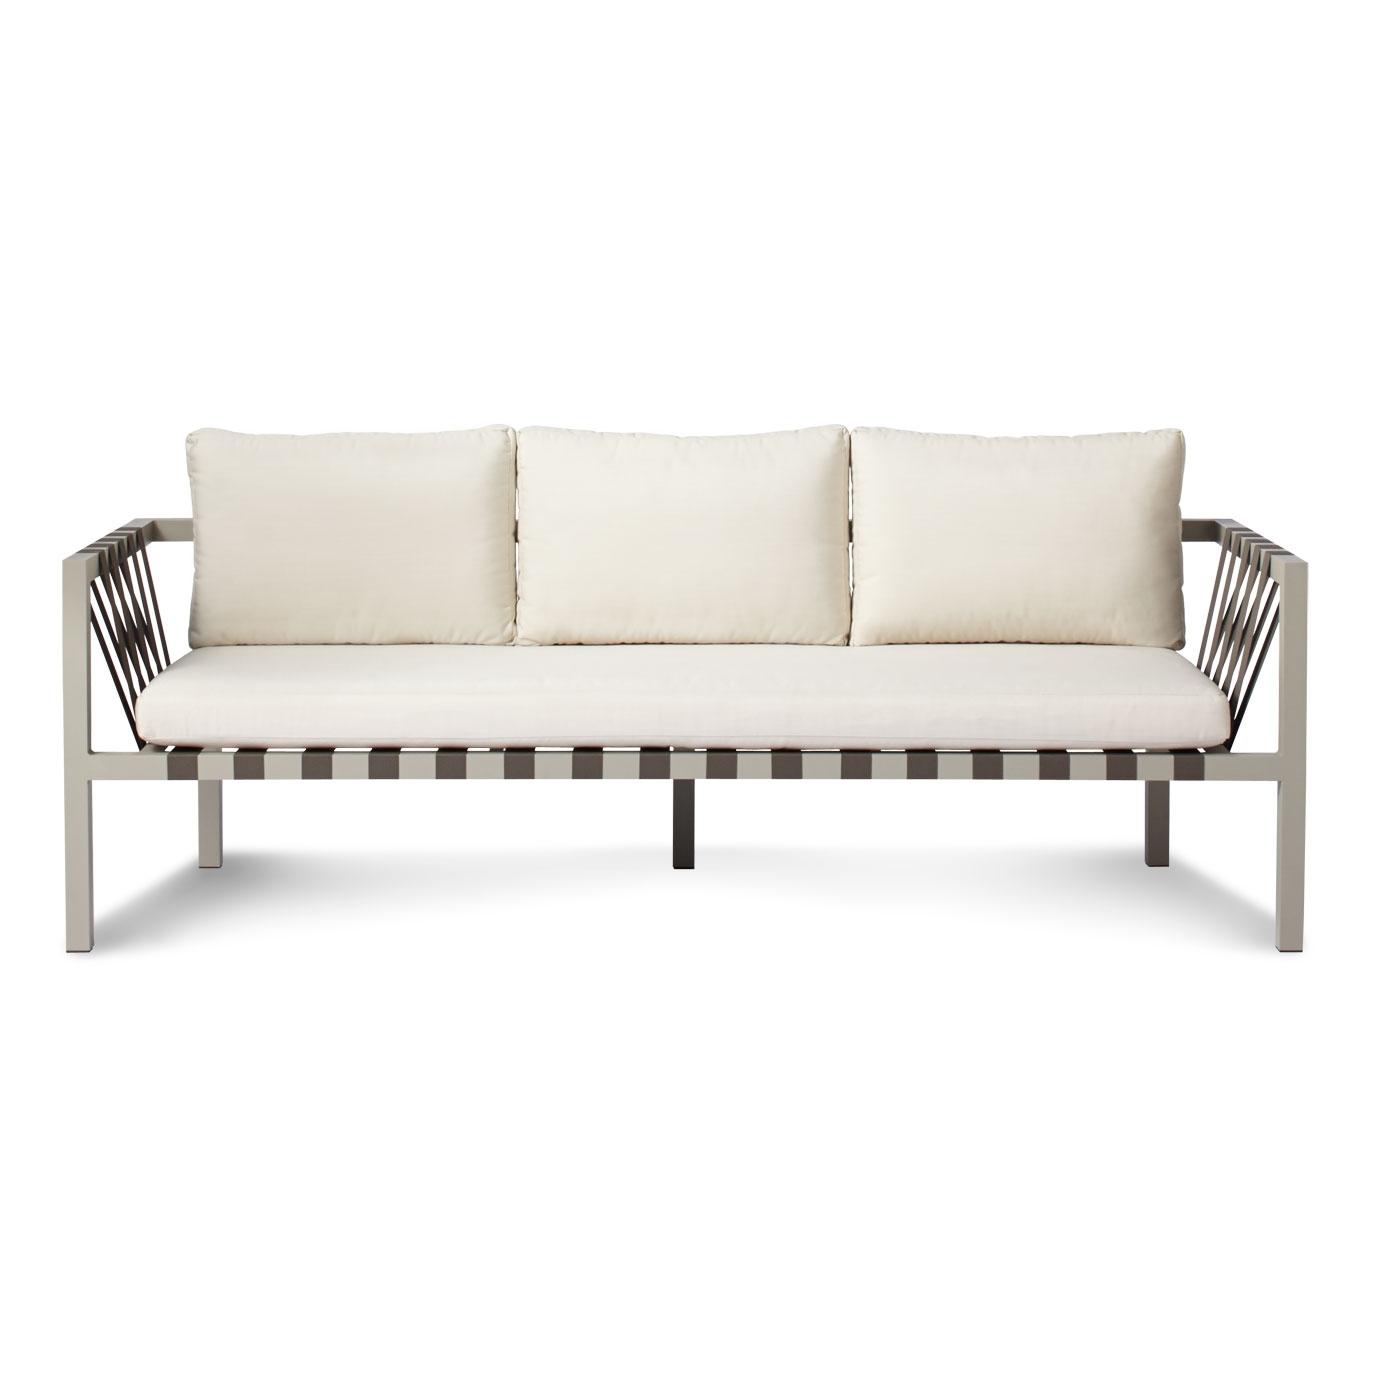 Modern 3 Seater Sofas Regarding Trendy Jibe Outdoor 3 Seat Sofa – Modern Outdoor Sofas (View 10 of 15)